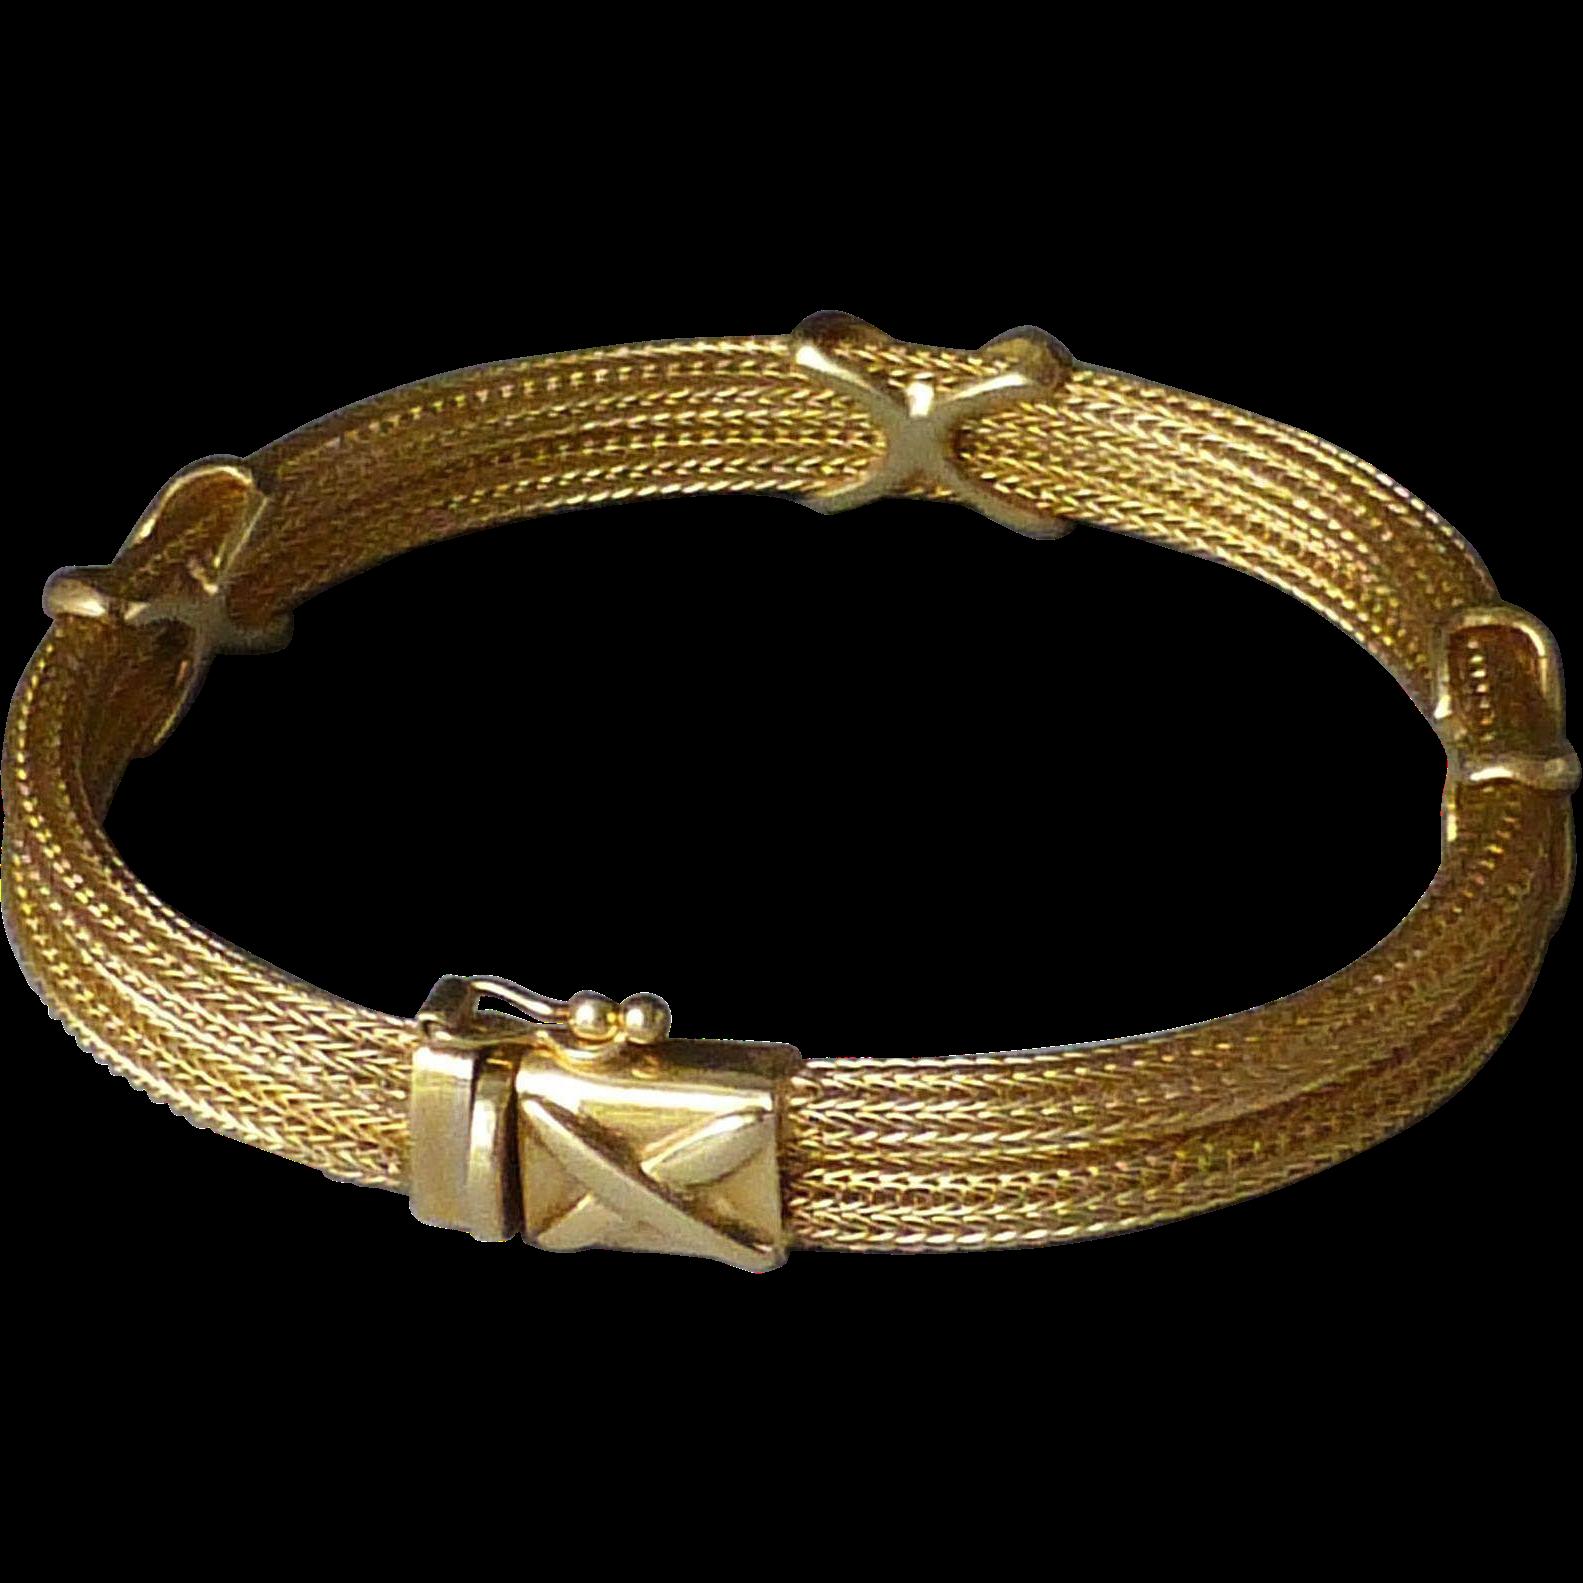 Gold Band Bracelet: Italian 14k Gold Double Band Flexible Mesh Chain X Motif